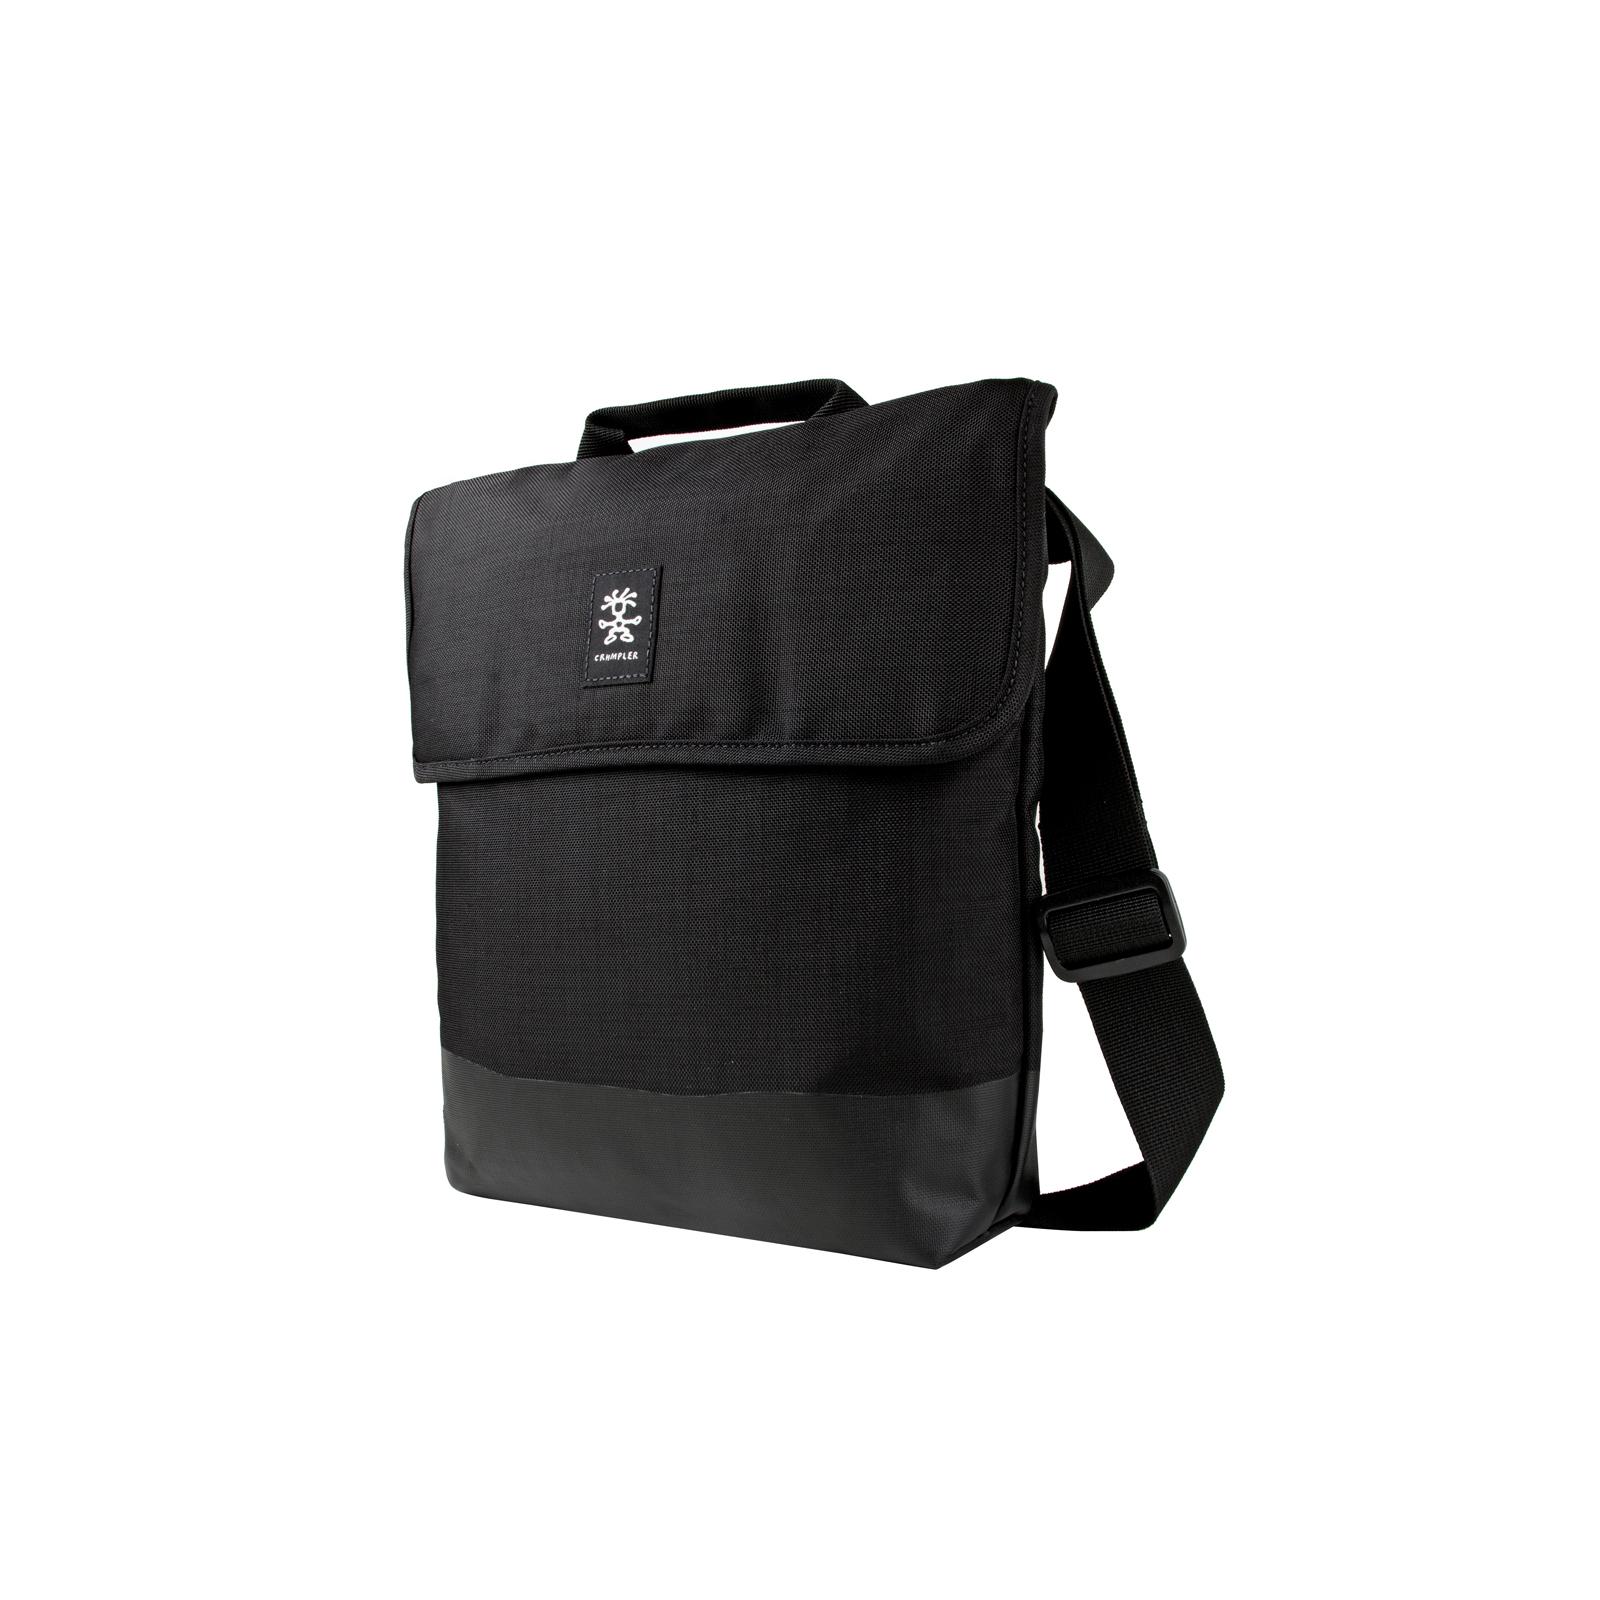 Чехол для планшета Crumpler 9 Private Surprise Sling Tablet/black-black (PSST-001) изображение 2